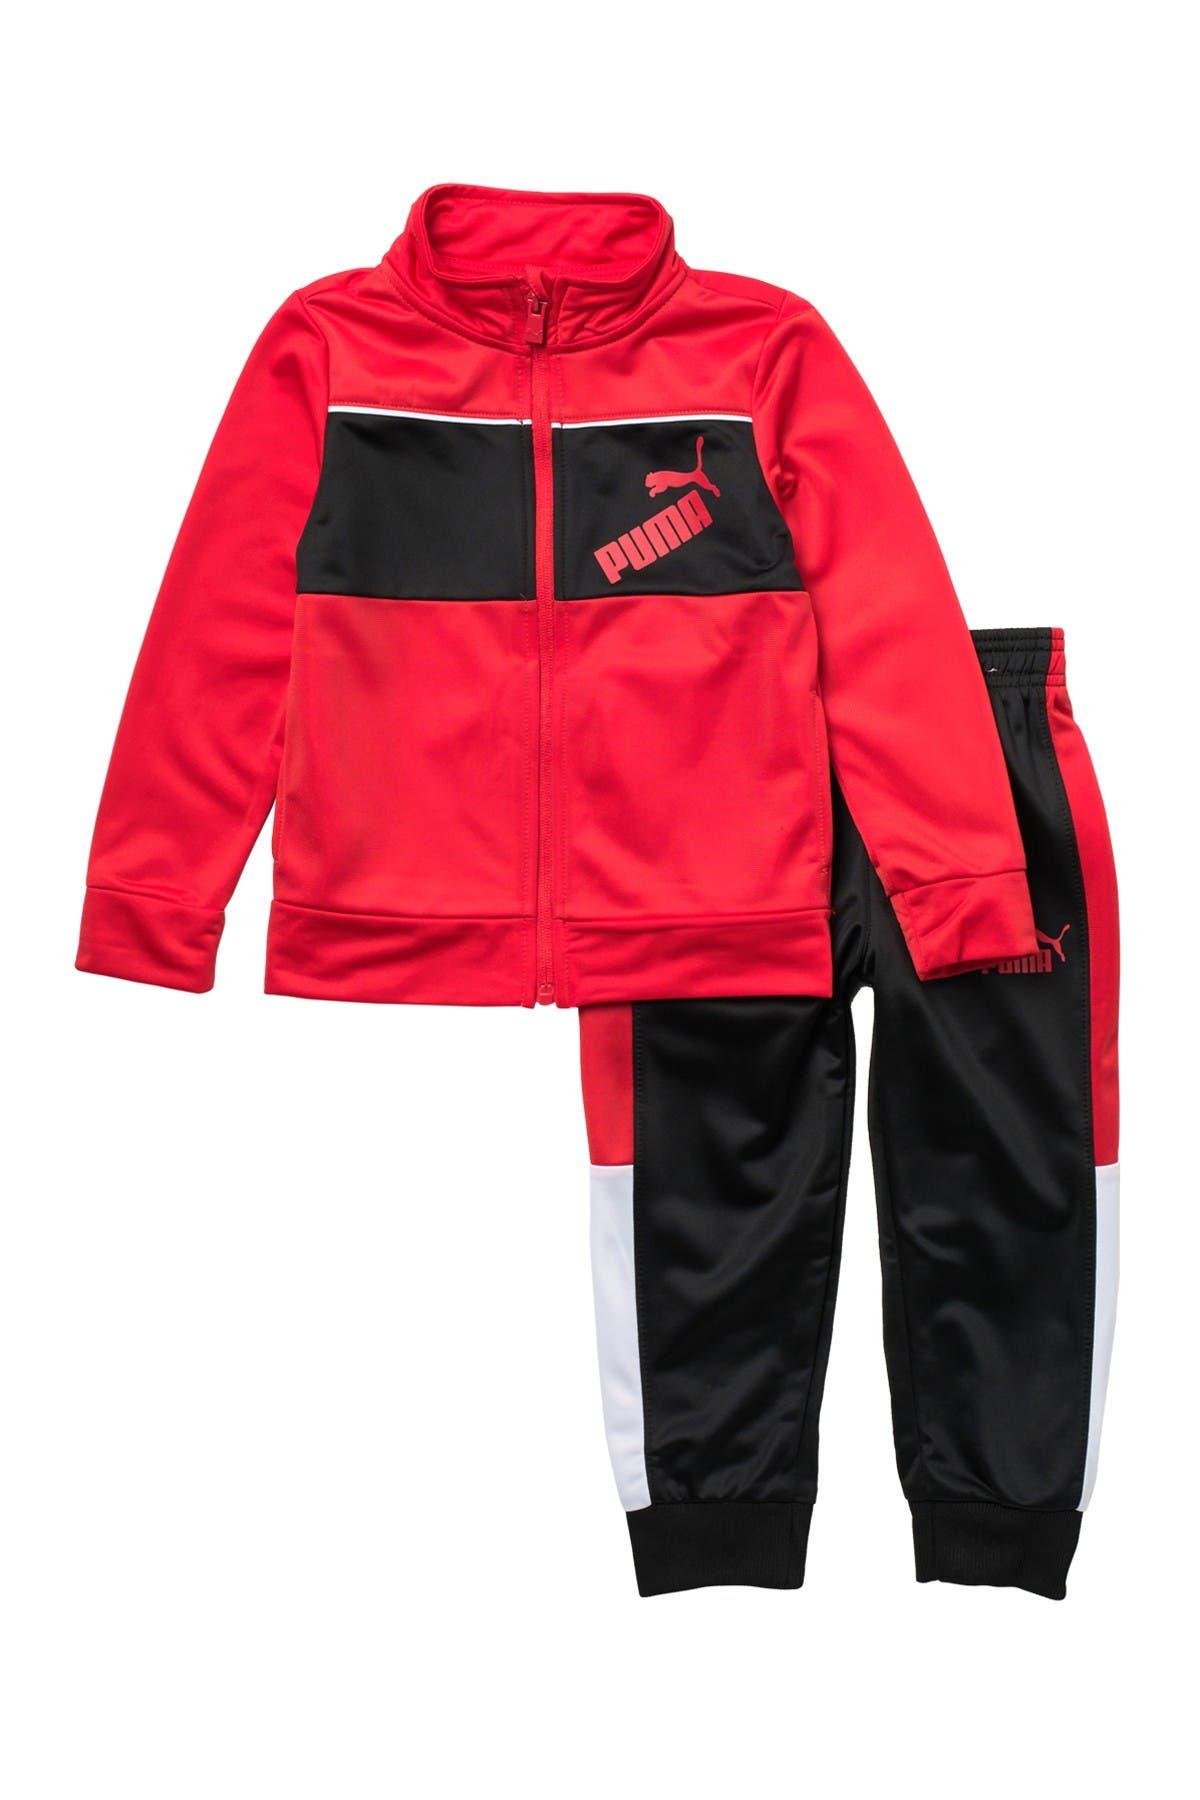 Image of PUMA Jacket & Pants Track Set